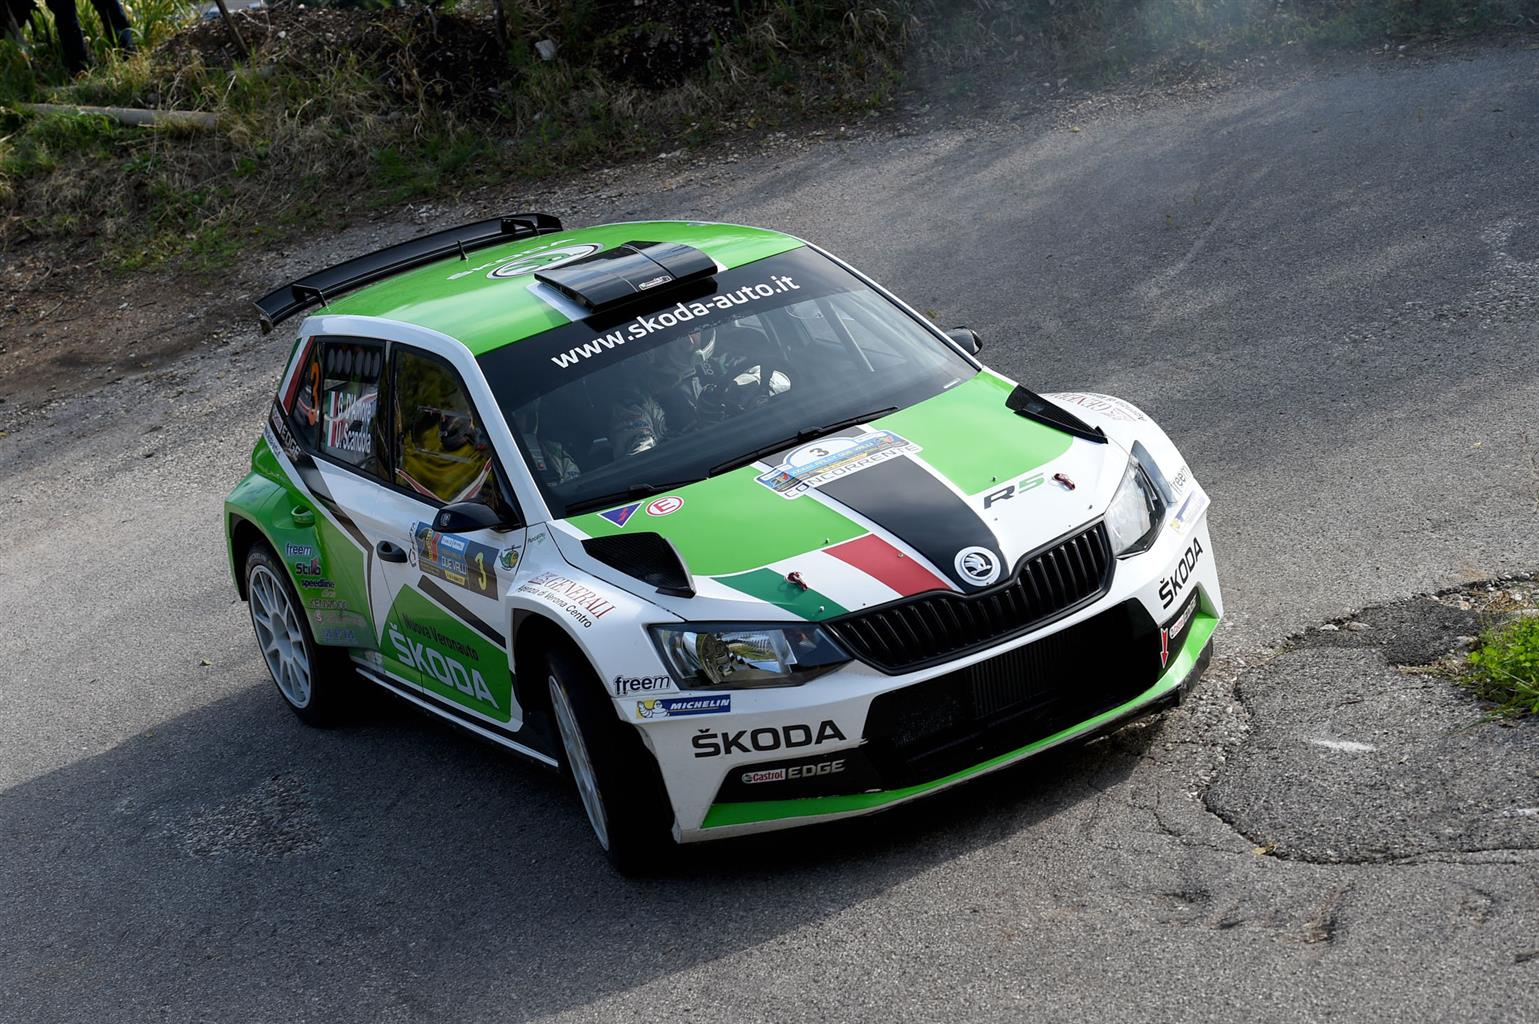 ŠKODA: l'adrenalina del rally a 360°